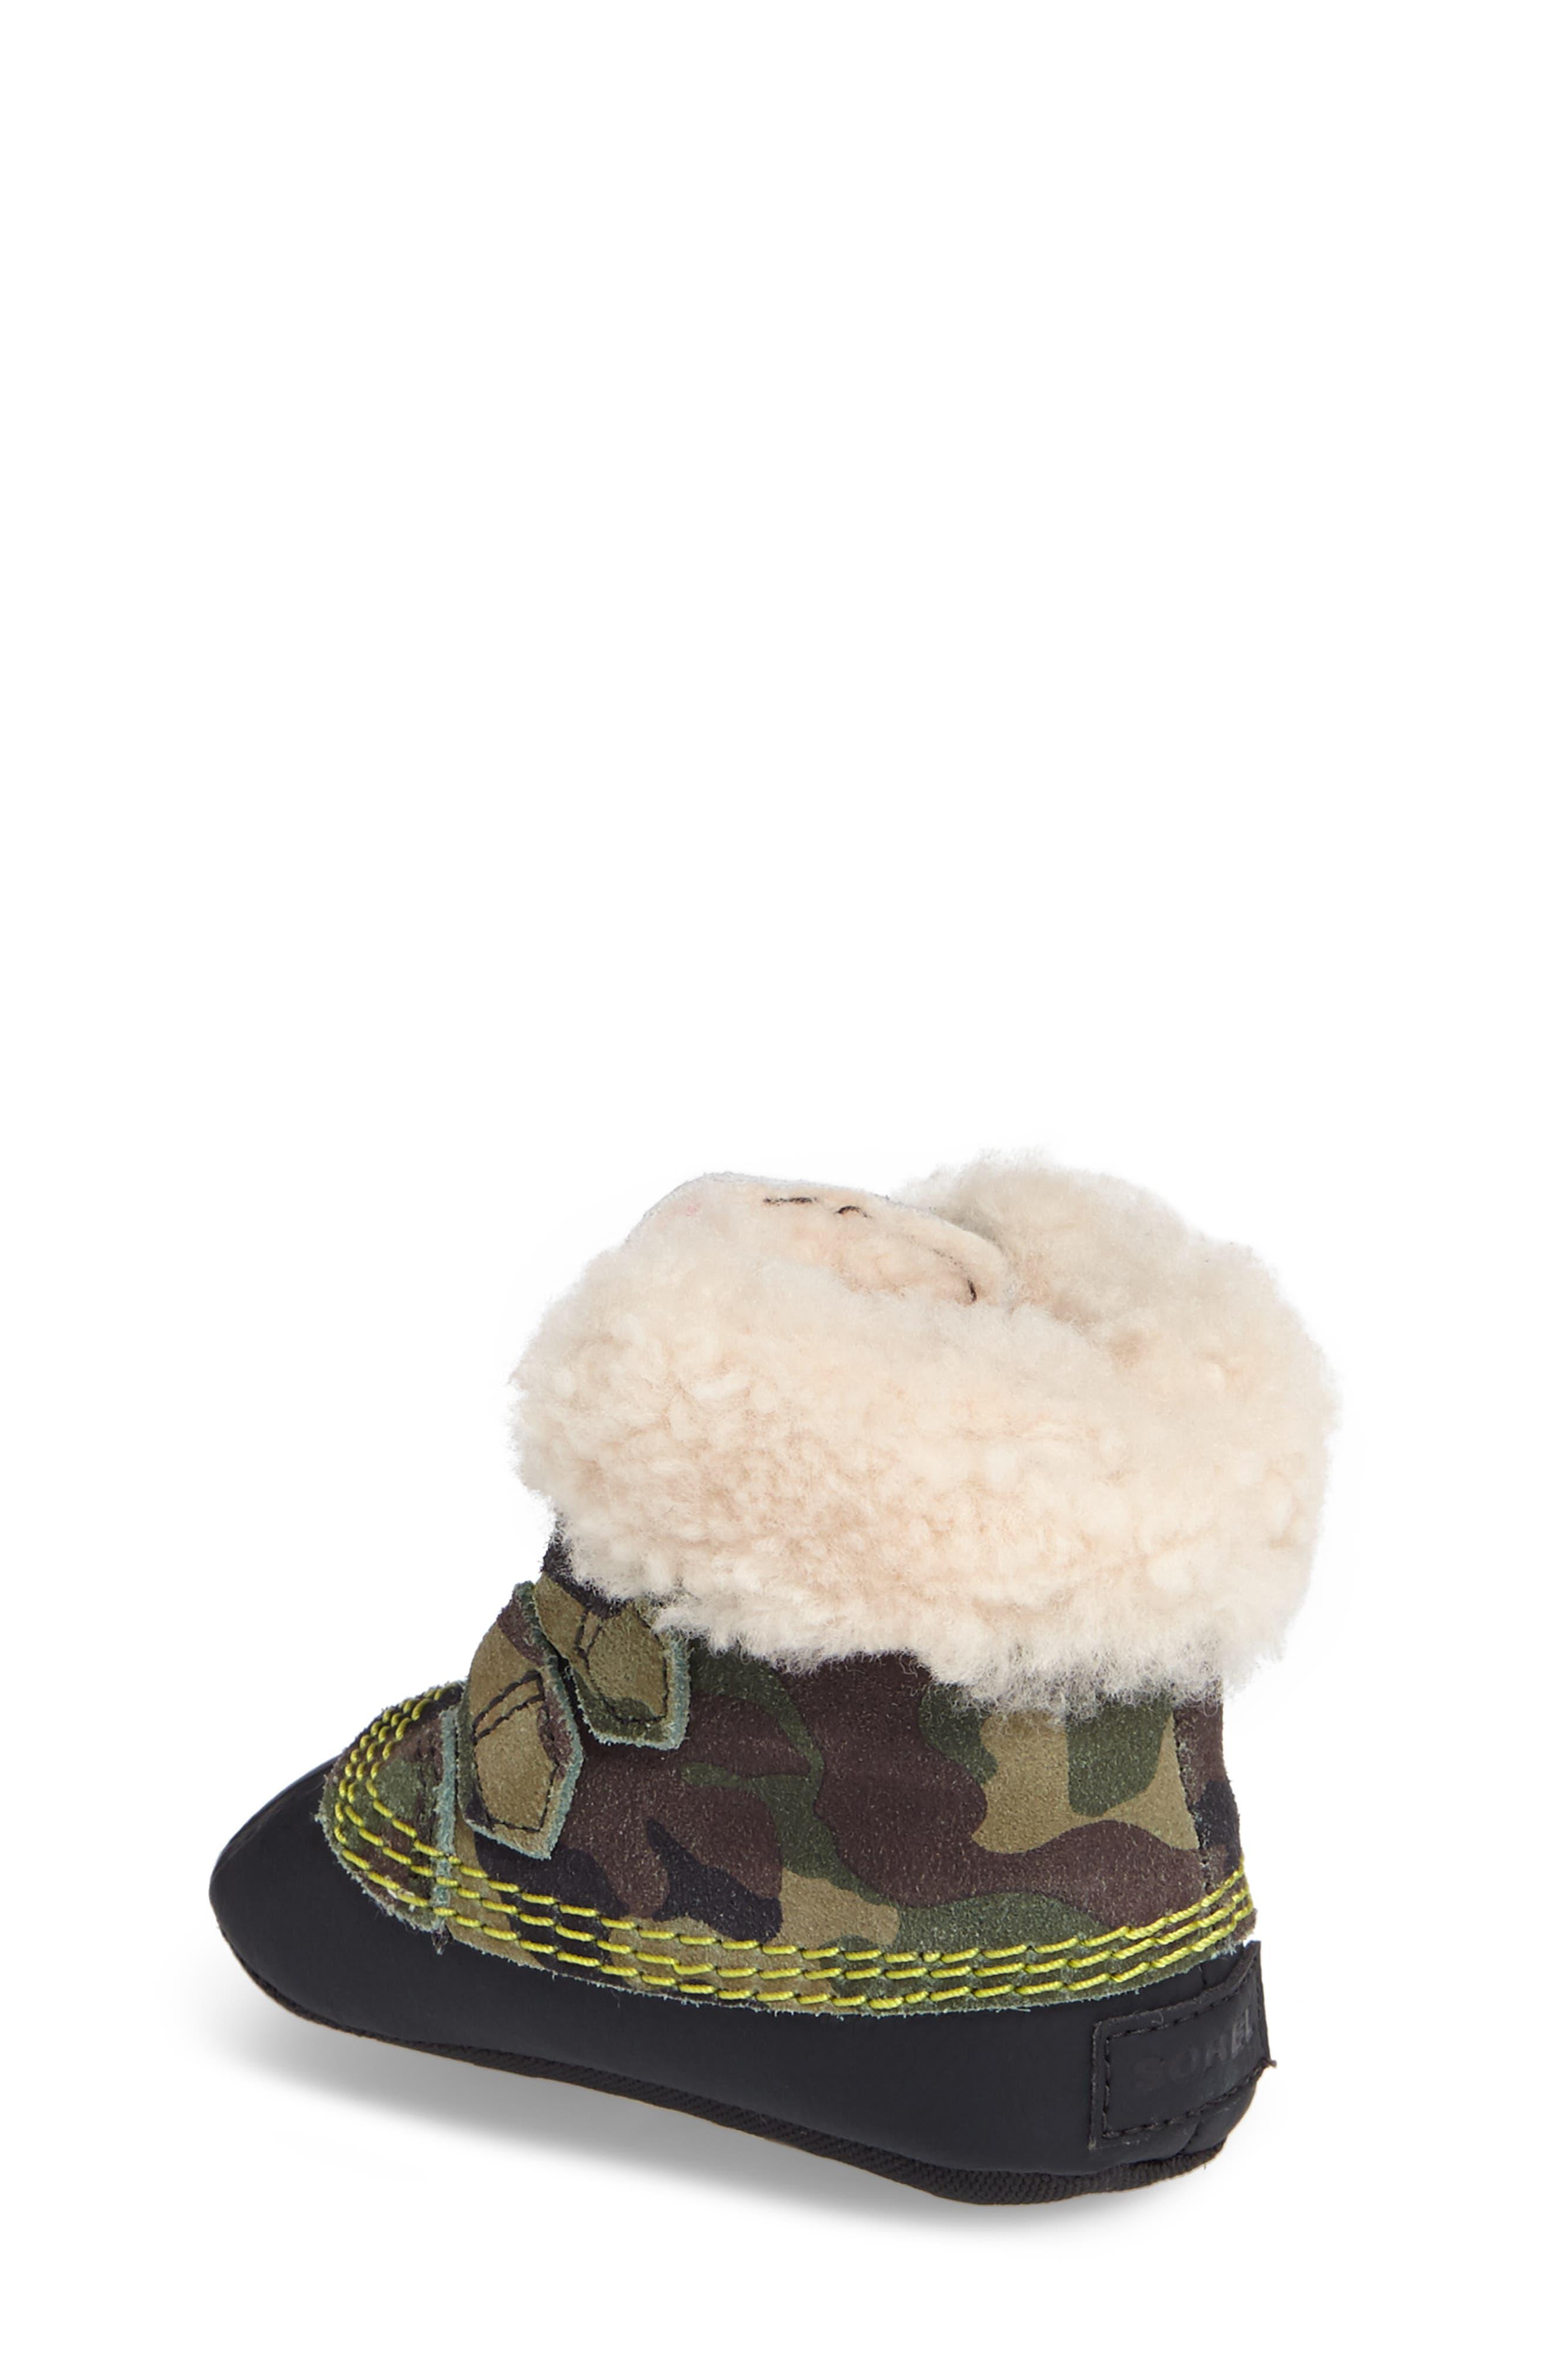 Caribootie Genuine Shearling Crib Shoe,                             Alternate thumbnail 10, color,